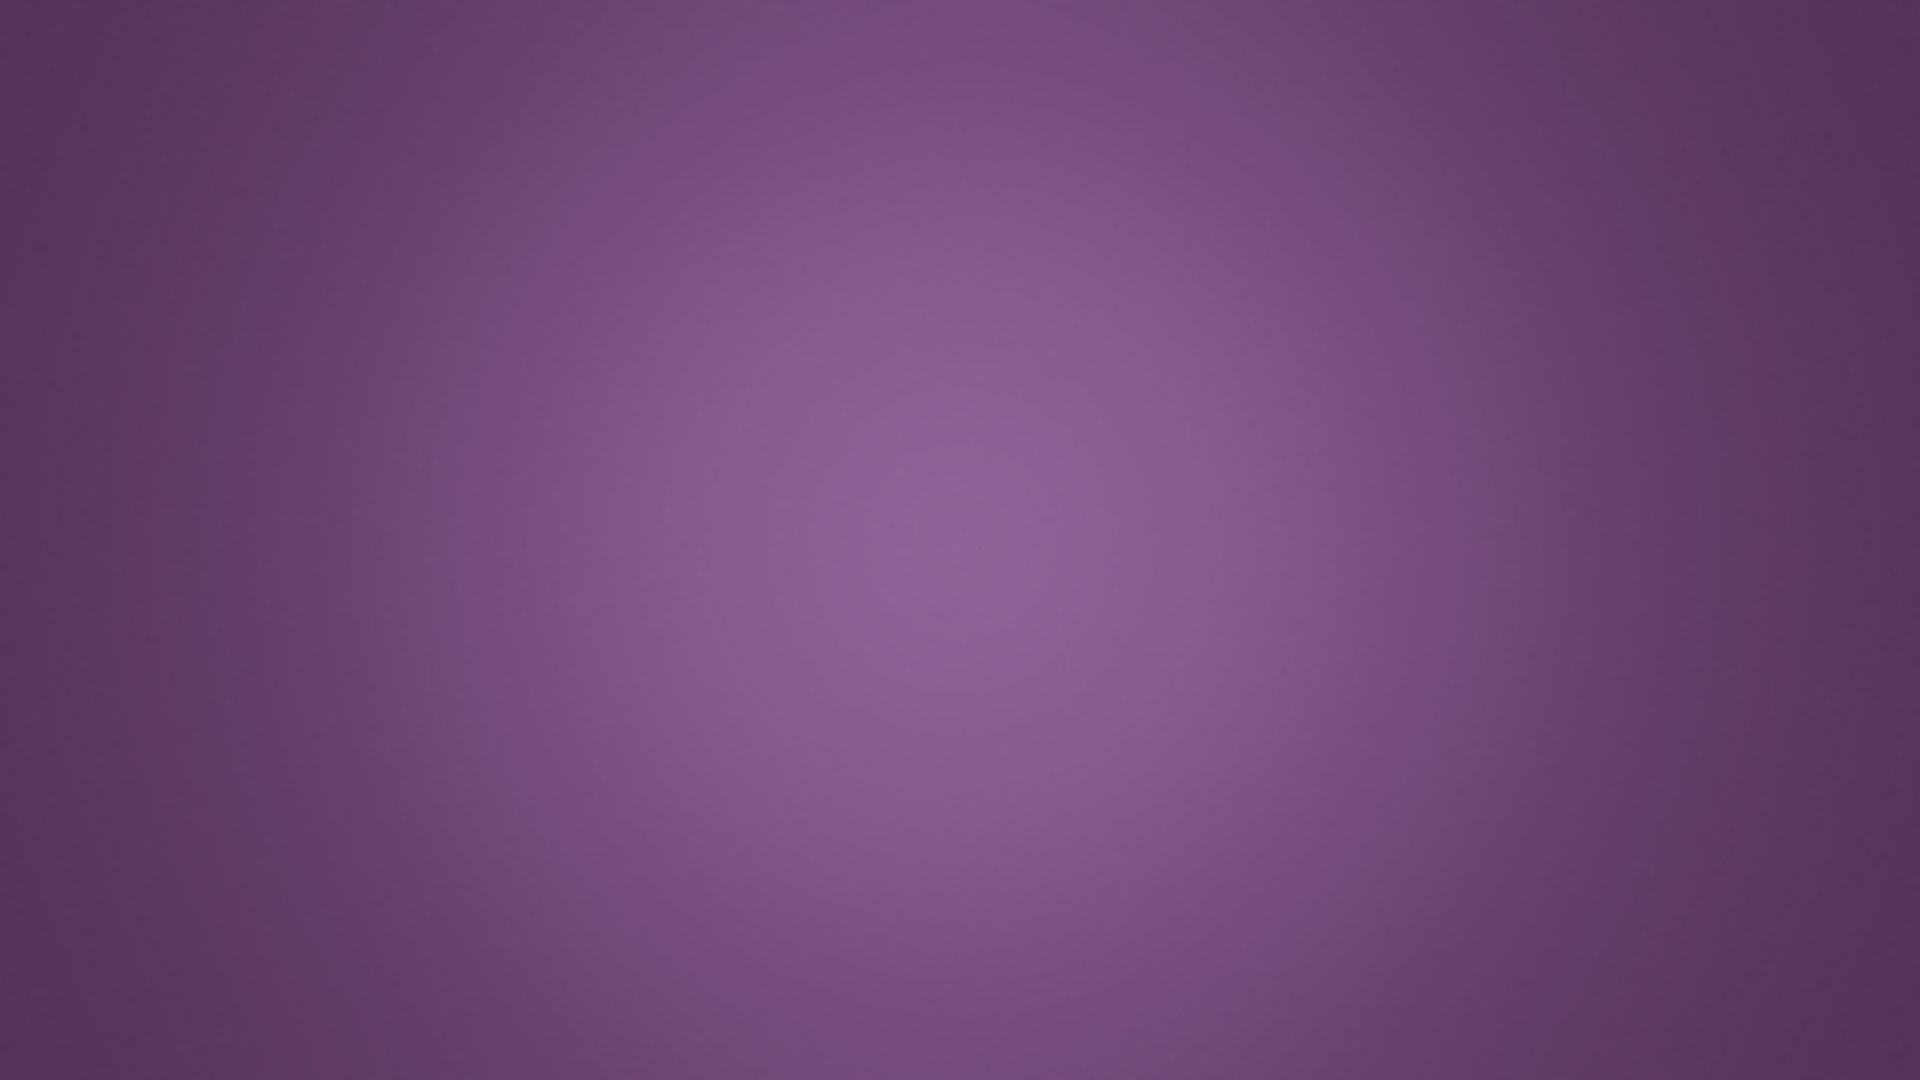 violettbg